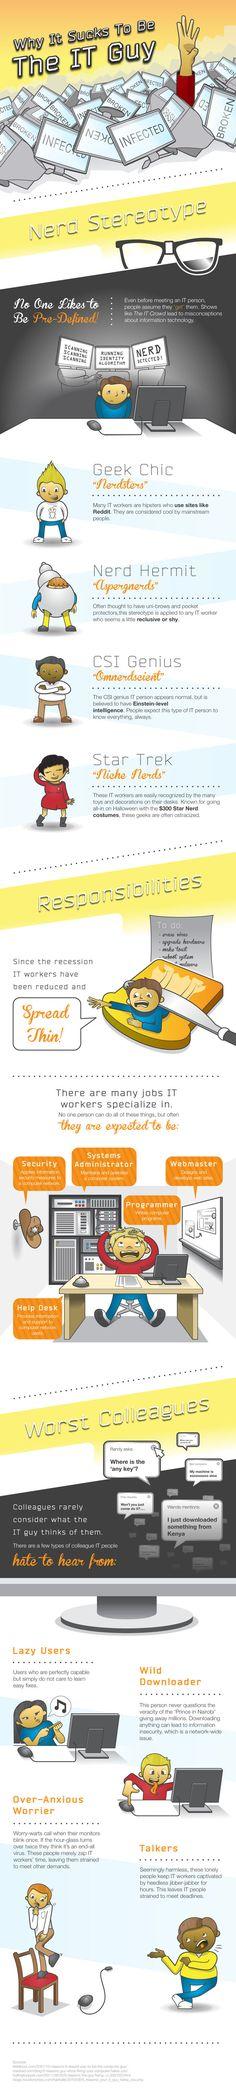 Being the IT Guy sucks!